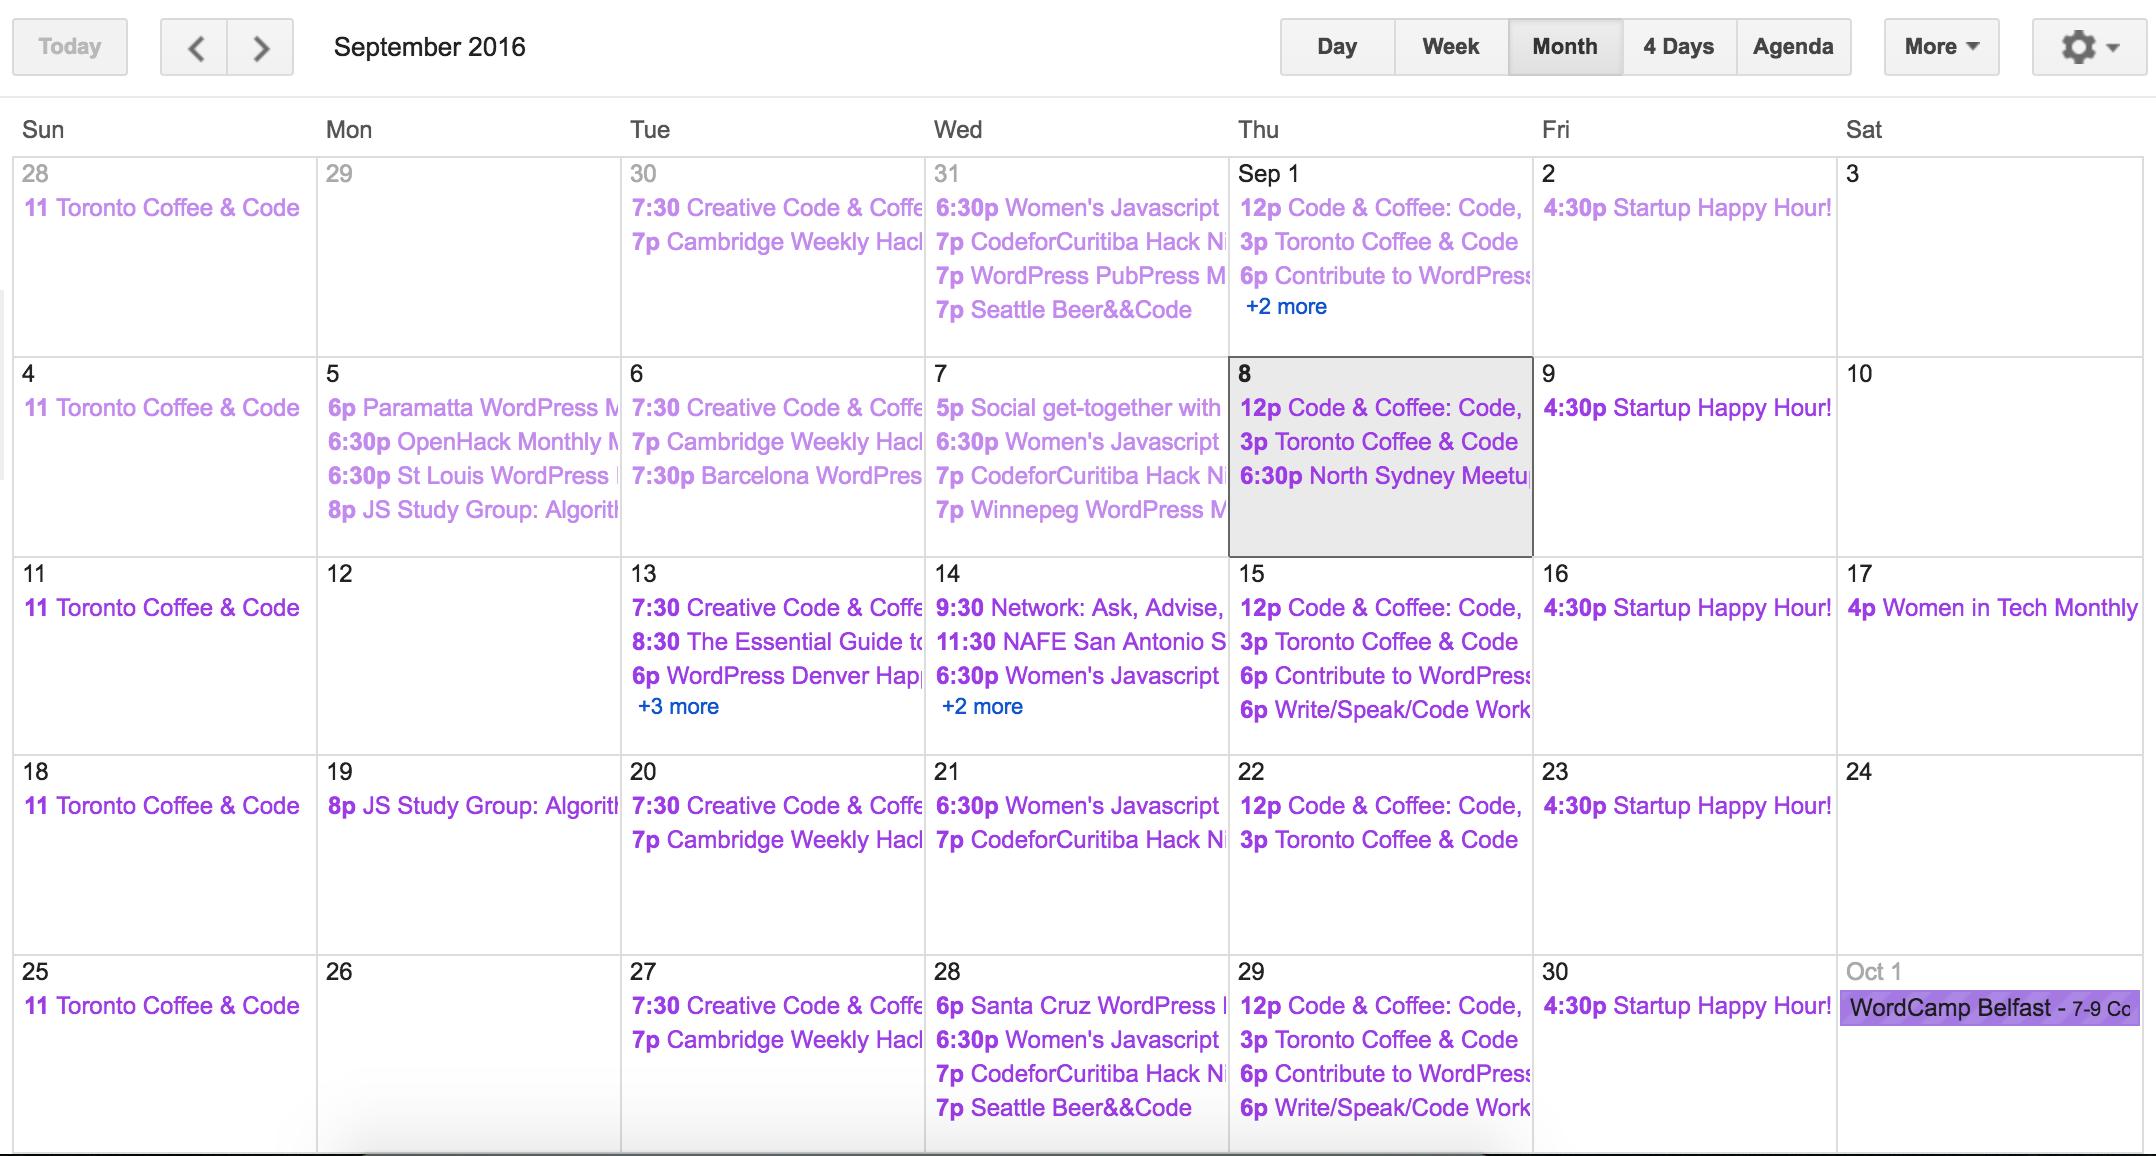 Wrong time on Google Calendar Import | The Events Calendar